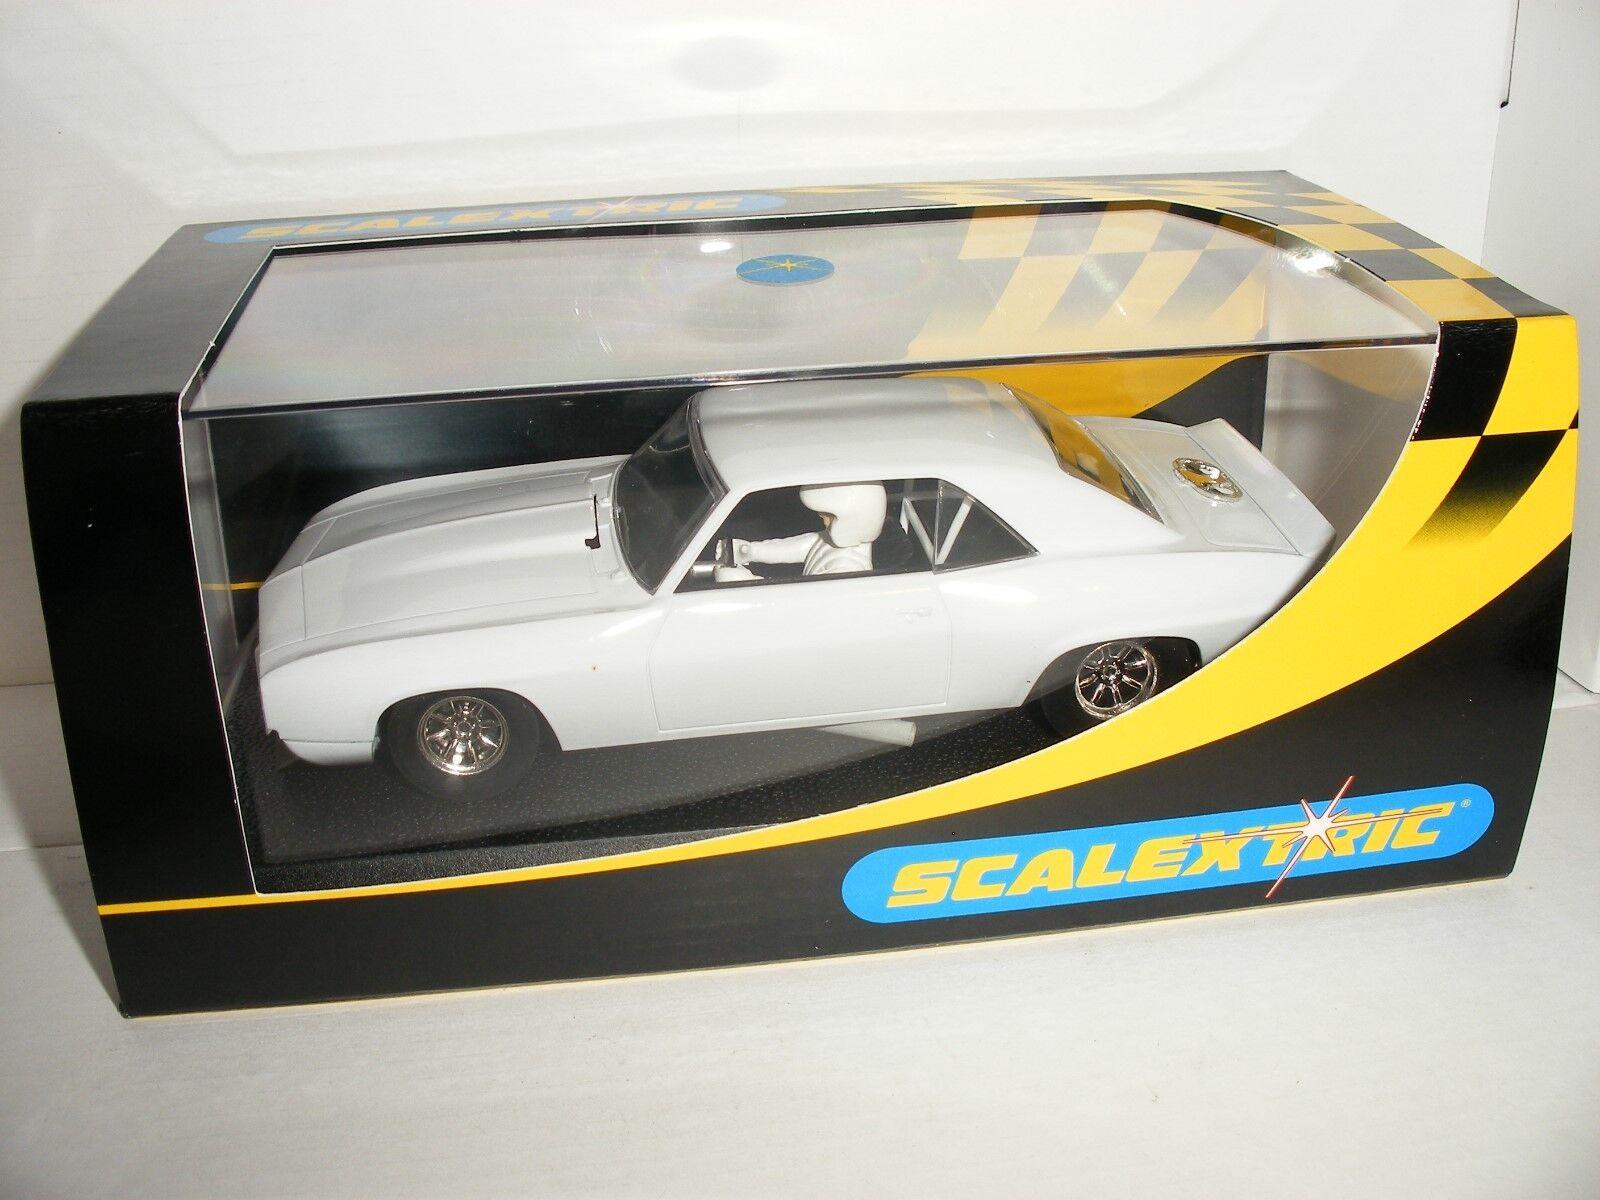 Scalextric - C2451 Chevrolet Camaro '69 Plain White - NEW